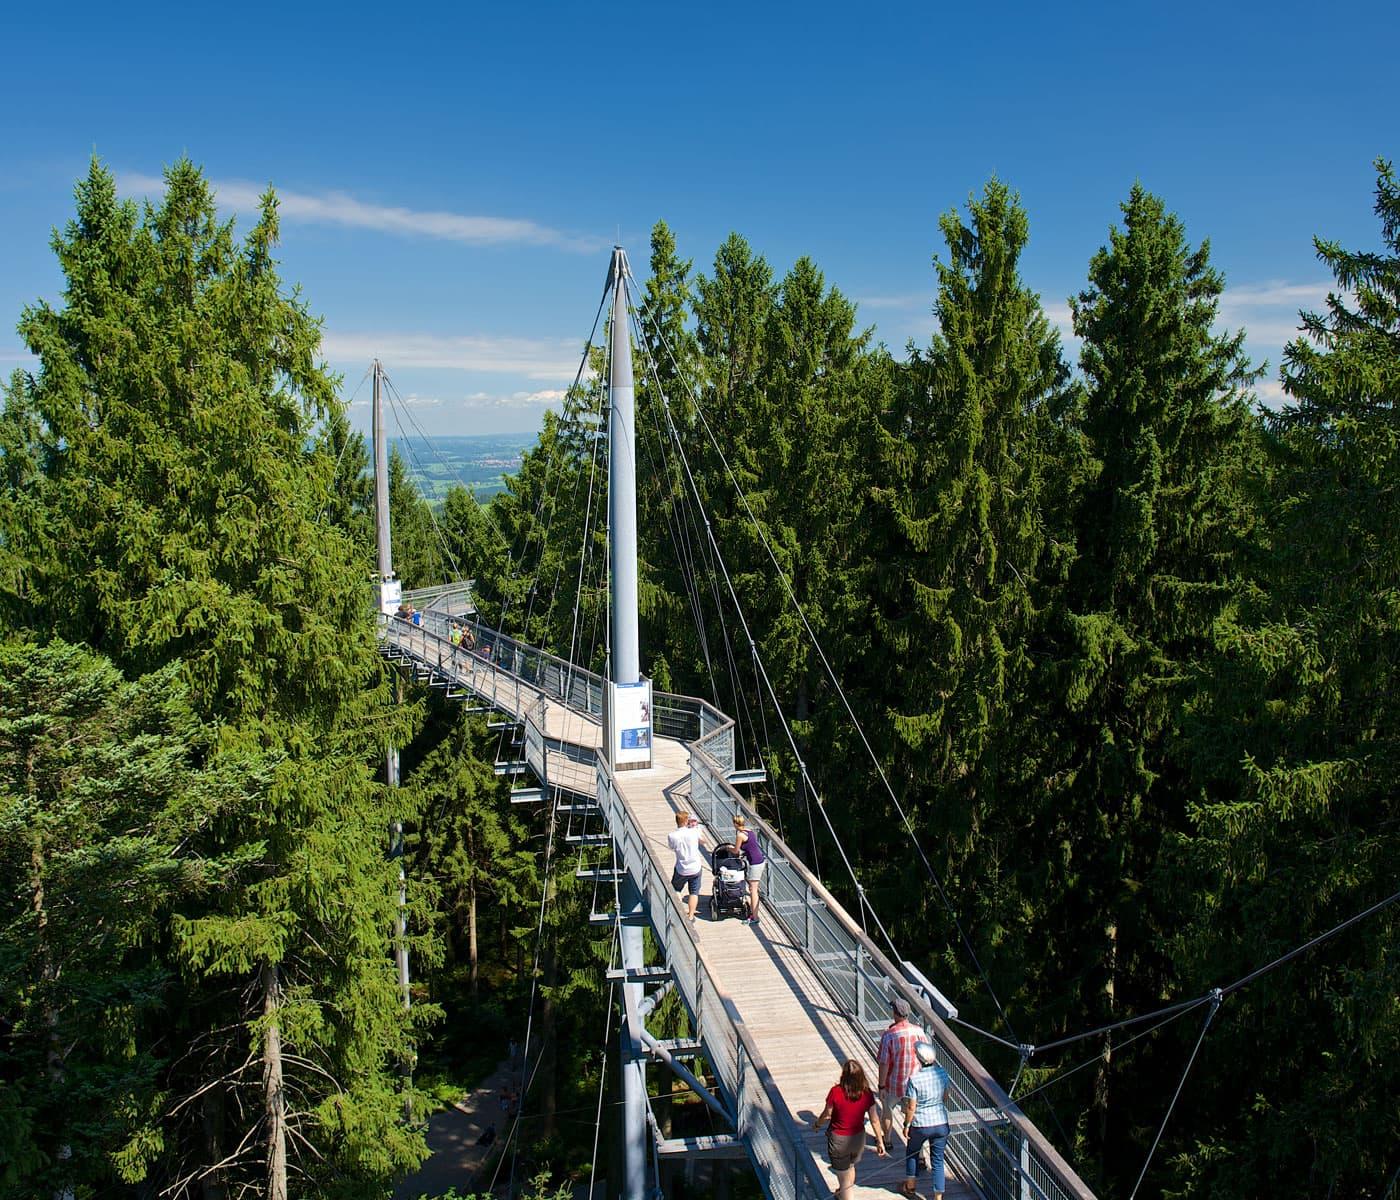 Familienausflug ins Voralpenland: Skywalk Allgäu // HIMBEER